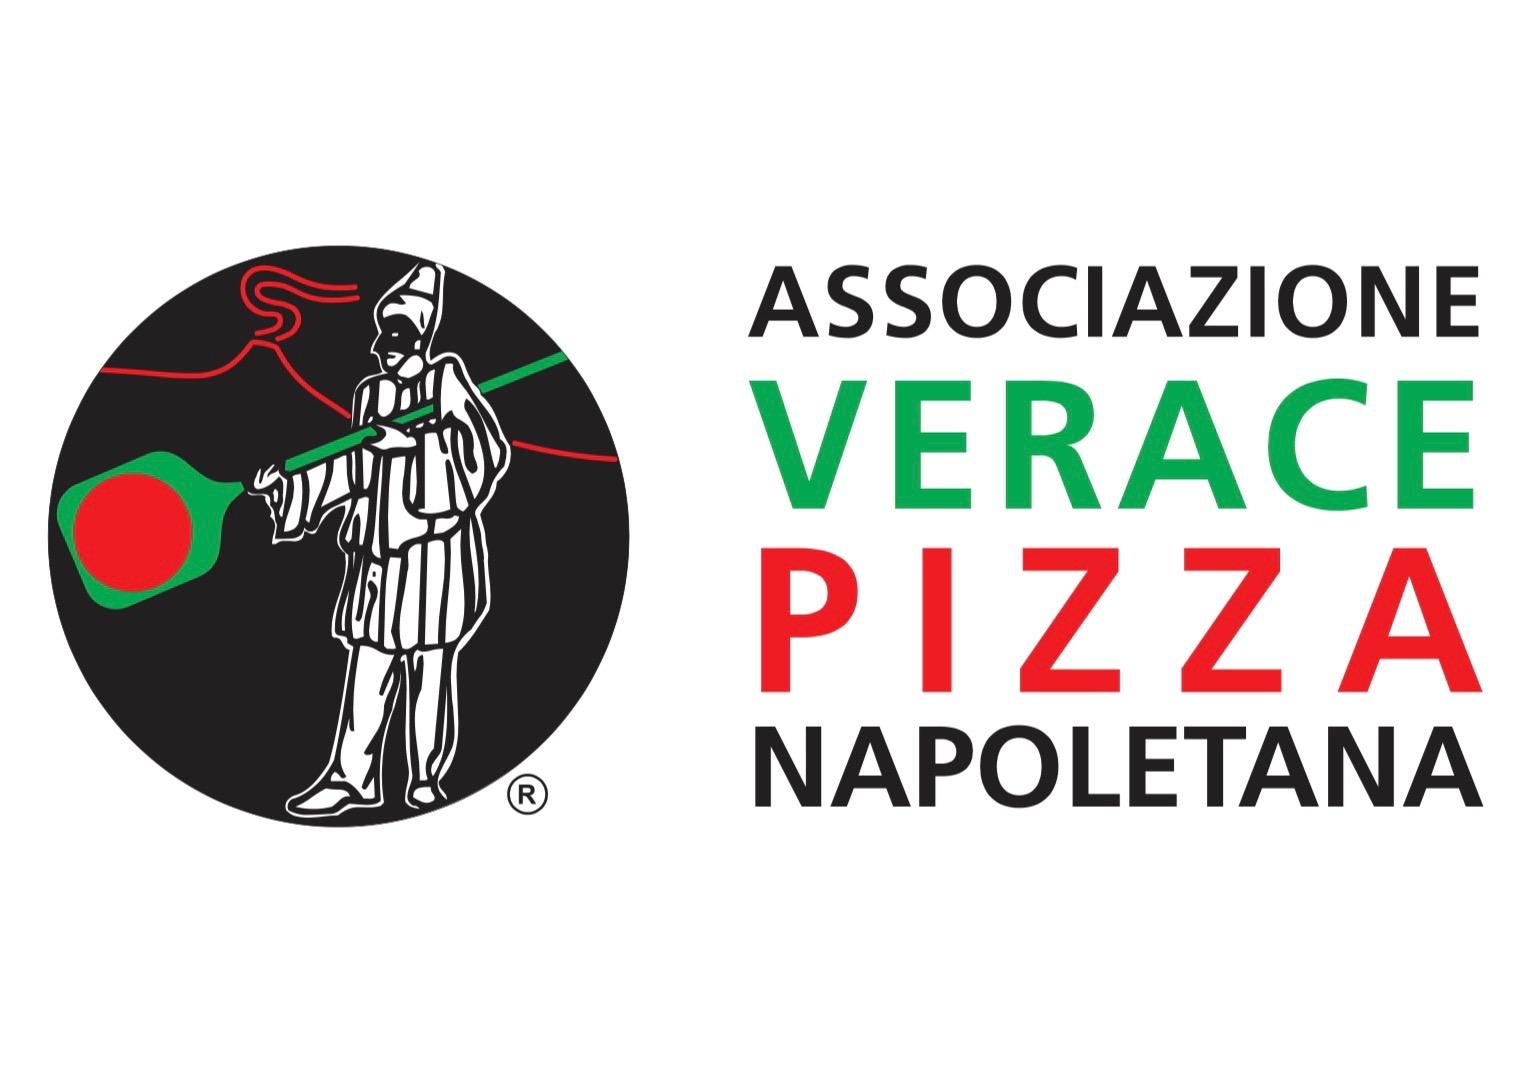 Certificado otorgado por la Verace Pizza Napoletana